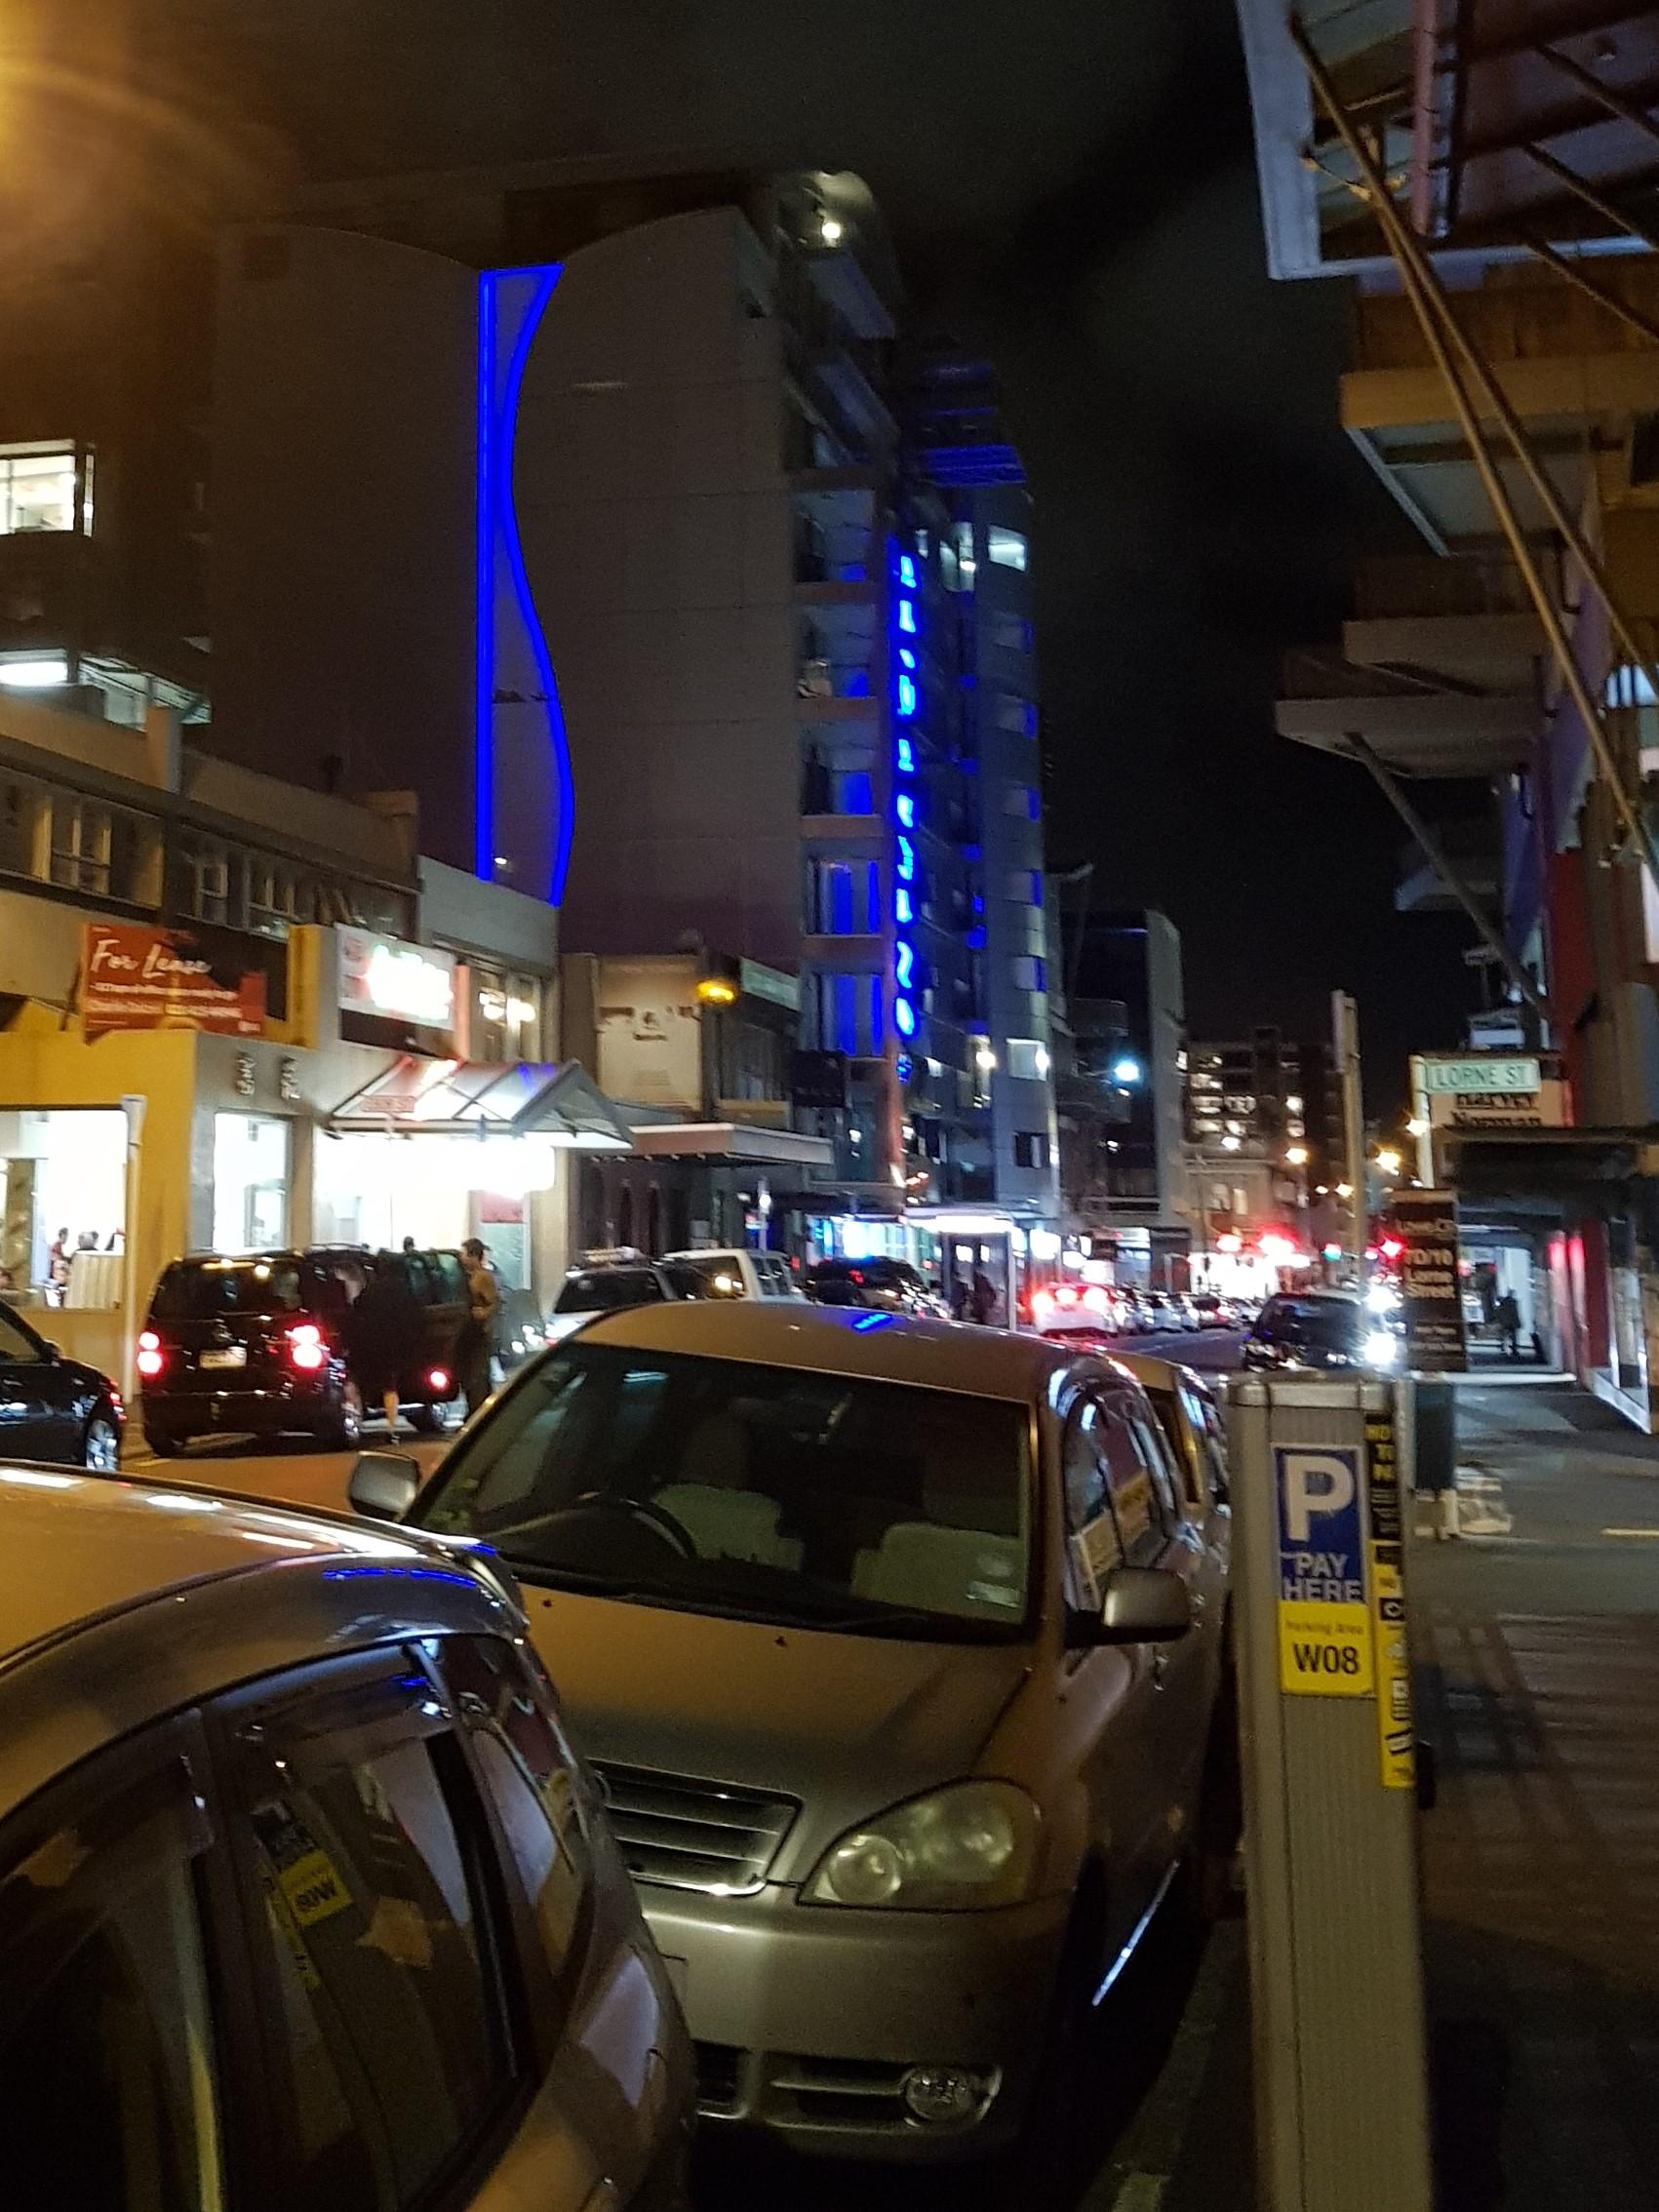 20180930_212547_2 big city lights